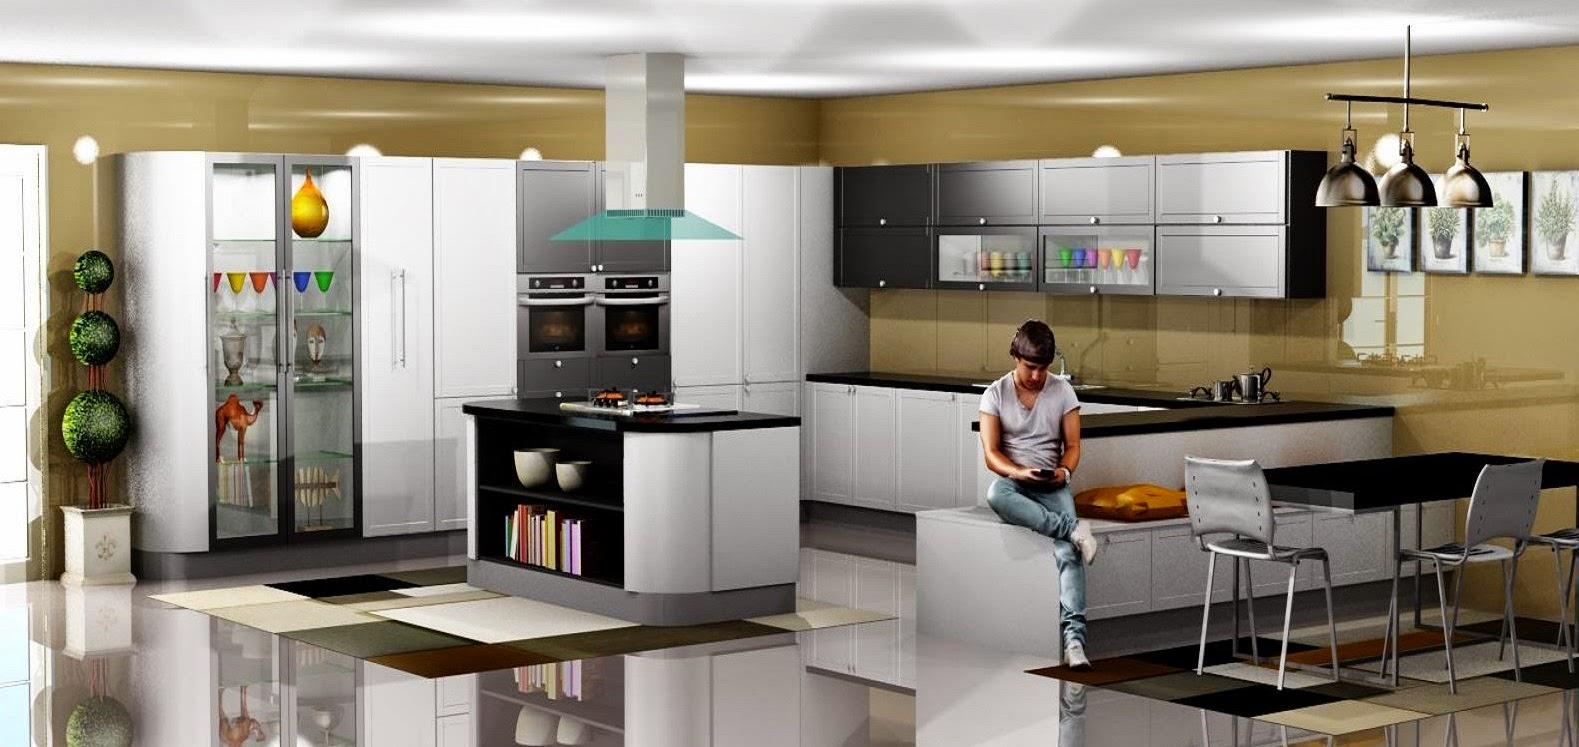 Dise o muebles de cocina cocina comedor con isla lacado for Diseno muebles cocina